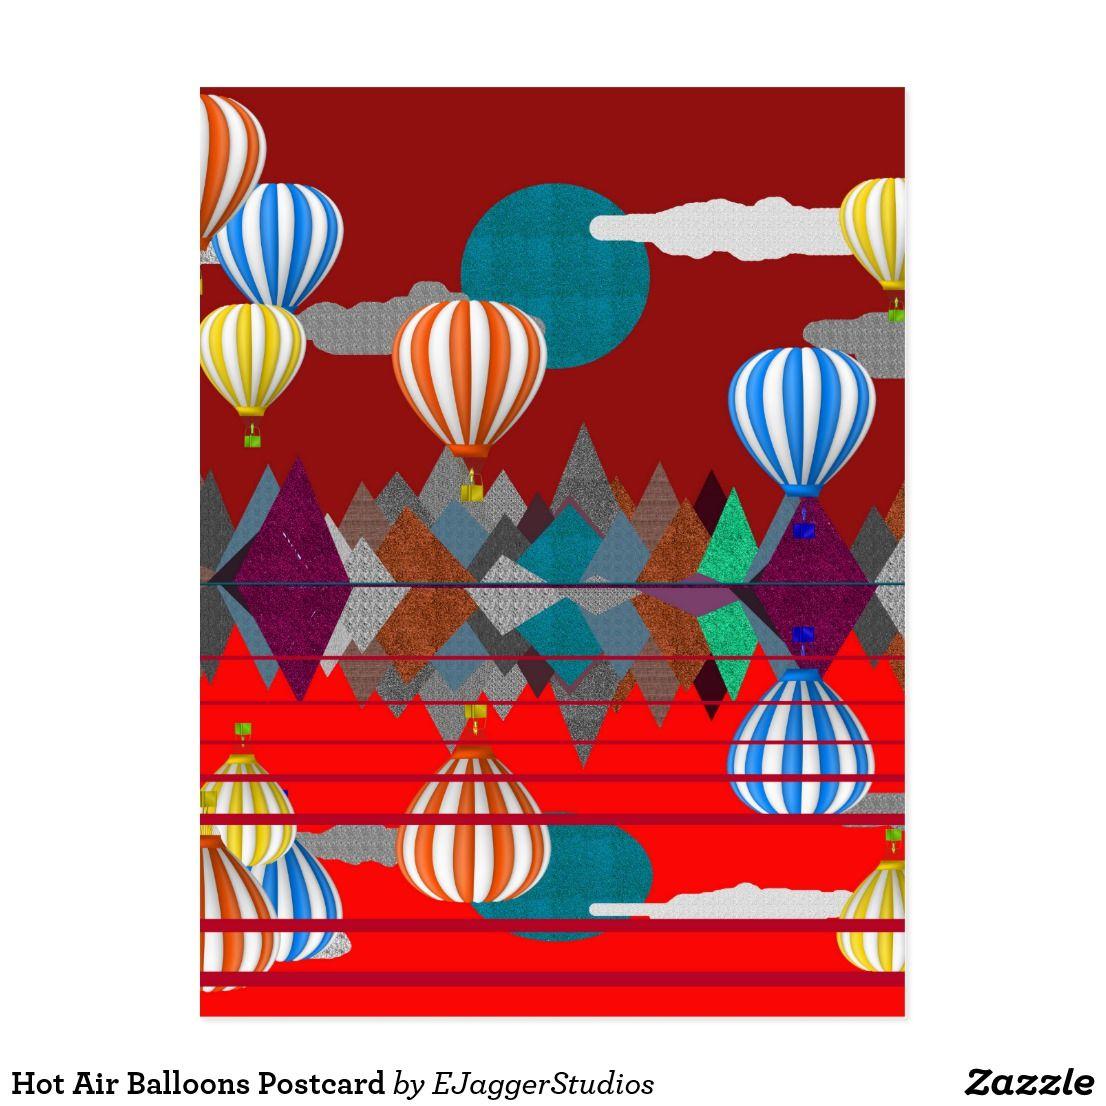 Hot Air Balloons Postcard Postcard, Postcards for sale